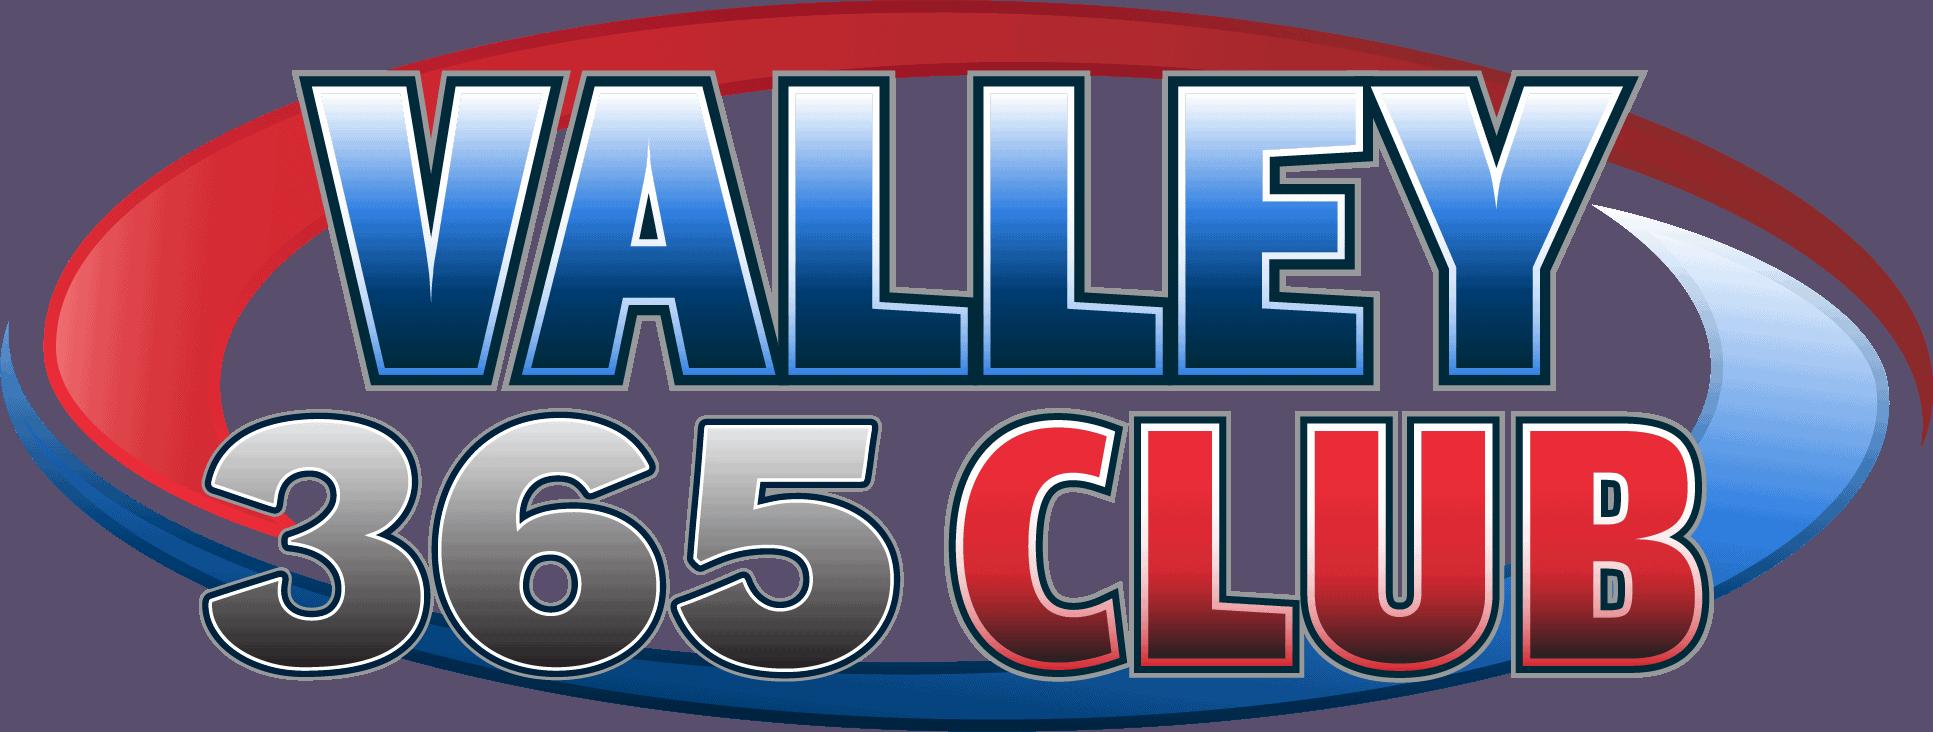 Valley-365-Club